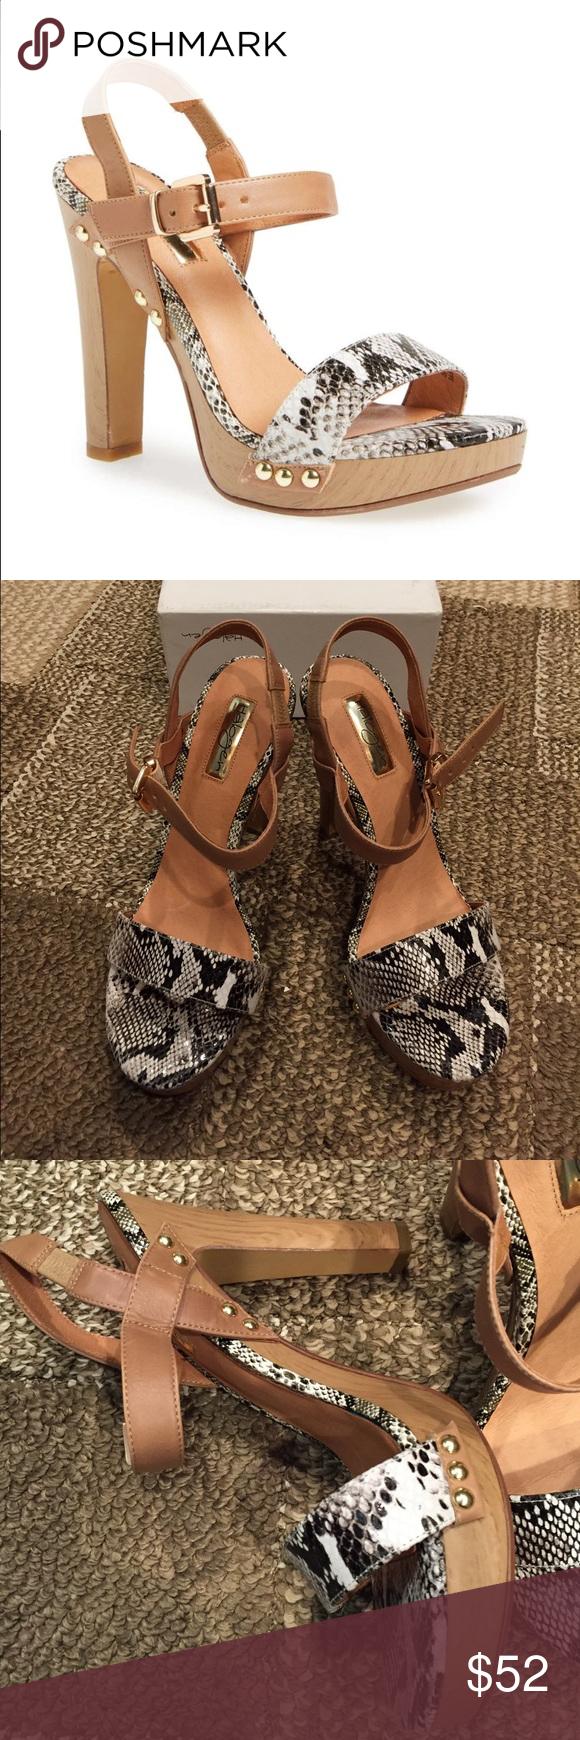 0c2e835d147 Halogen Viv natural snake print platform sandals Stunning print adds a  modern touch to the straps